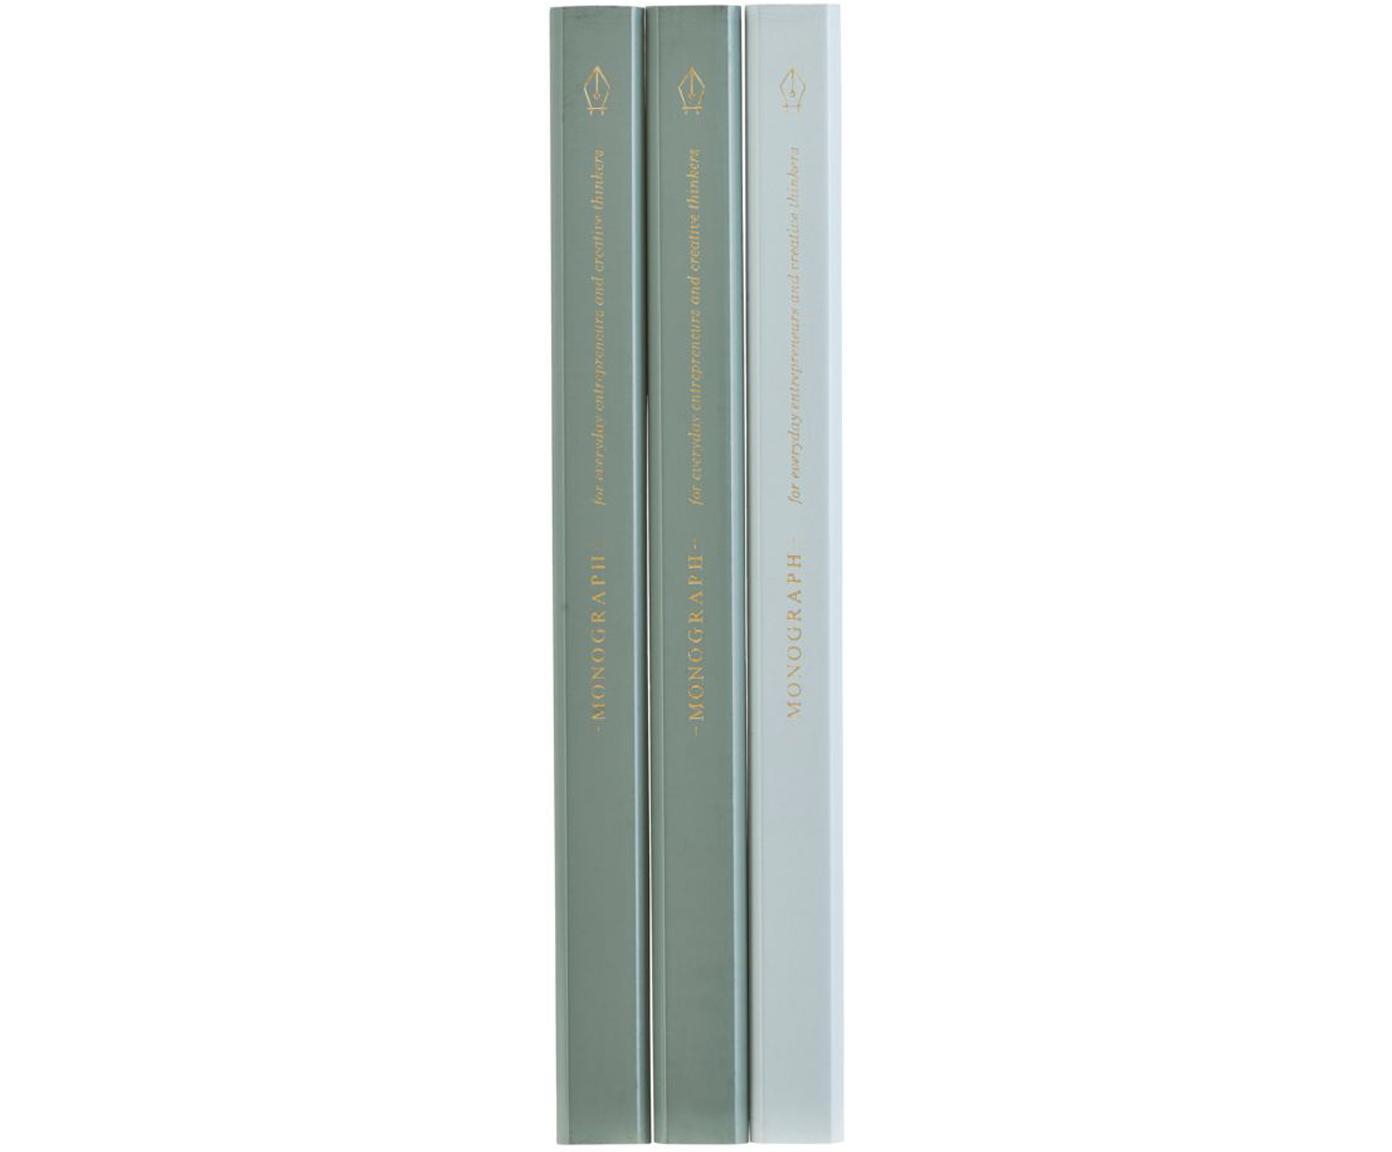 Set matite Carpenter, 3 pz., Legno, grafite, Verde, azzurro, Larg. 2 x Lung. 18 cm